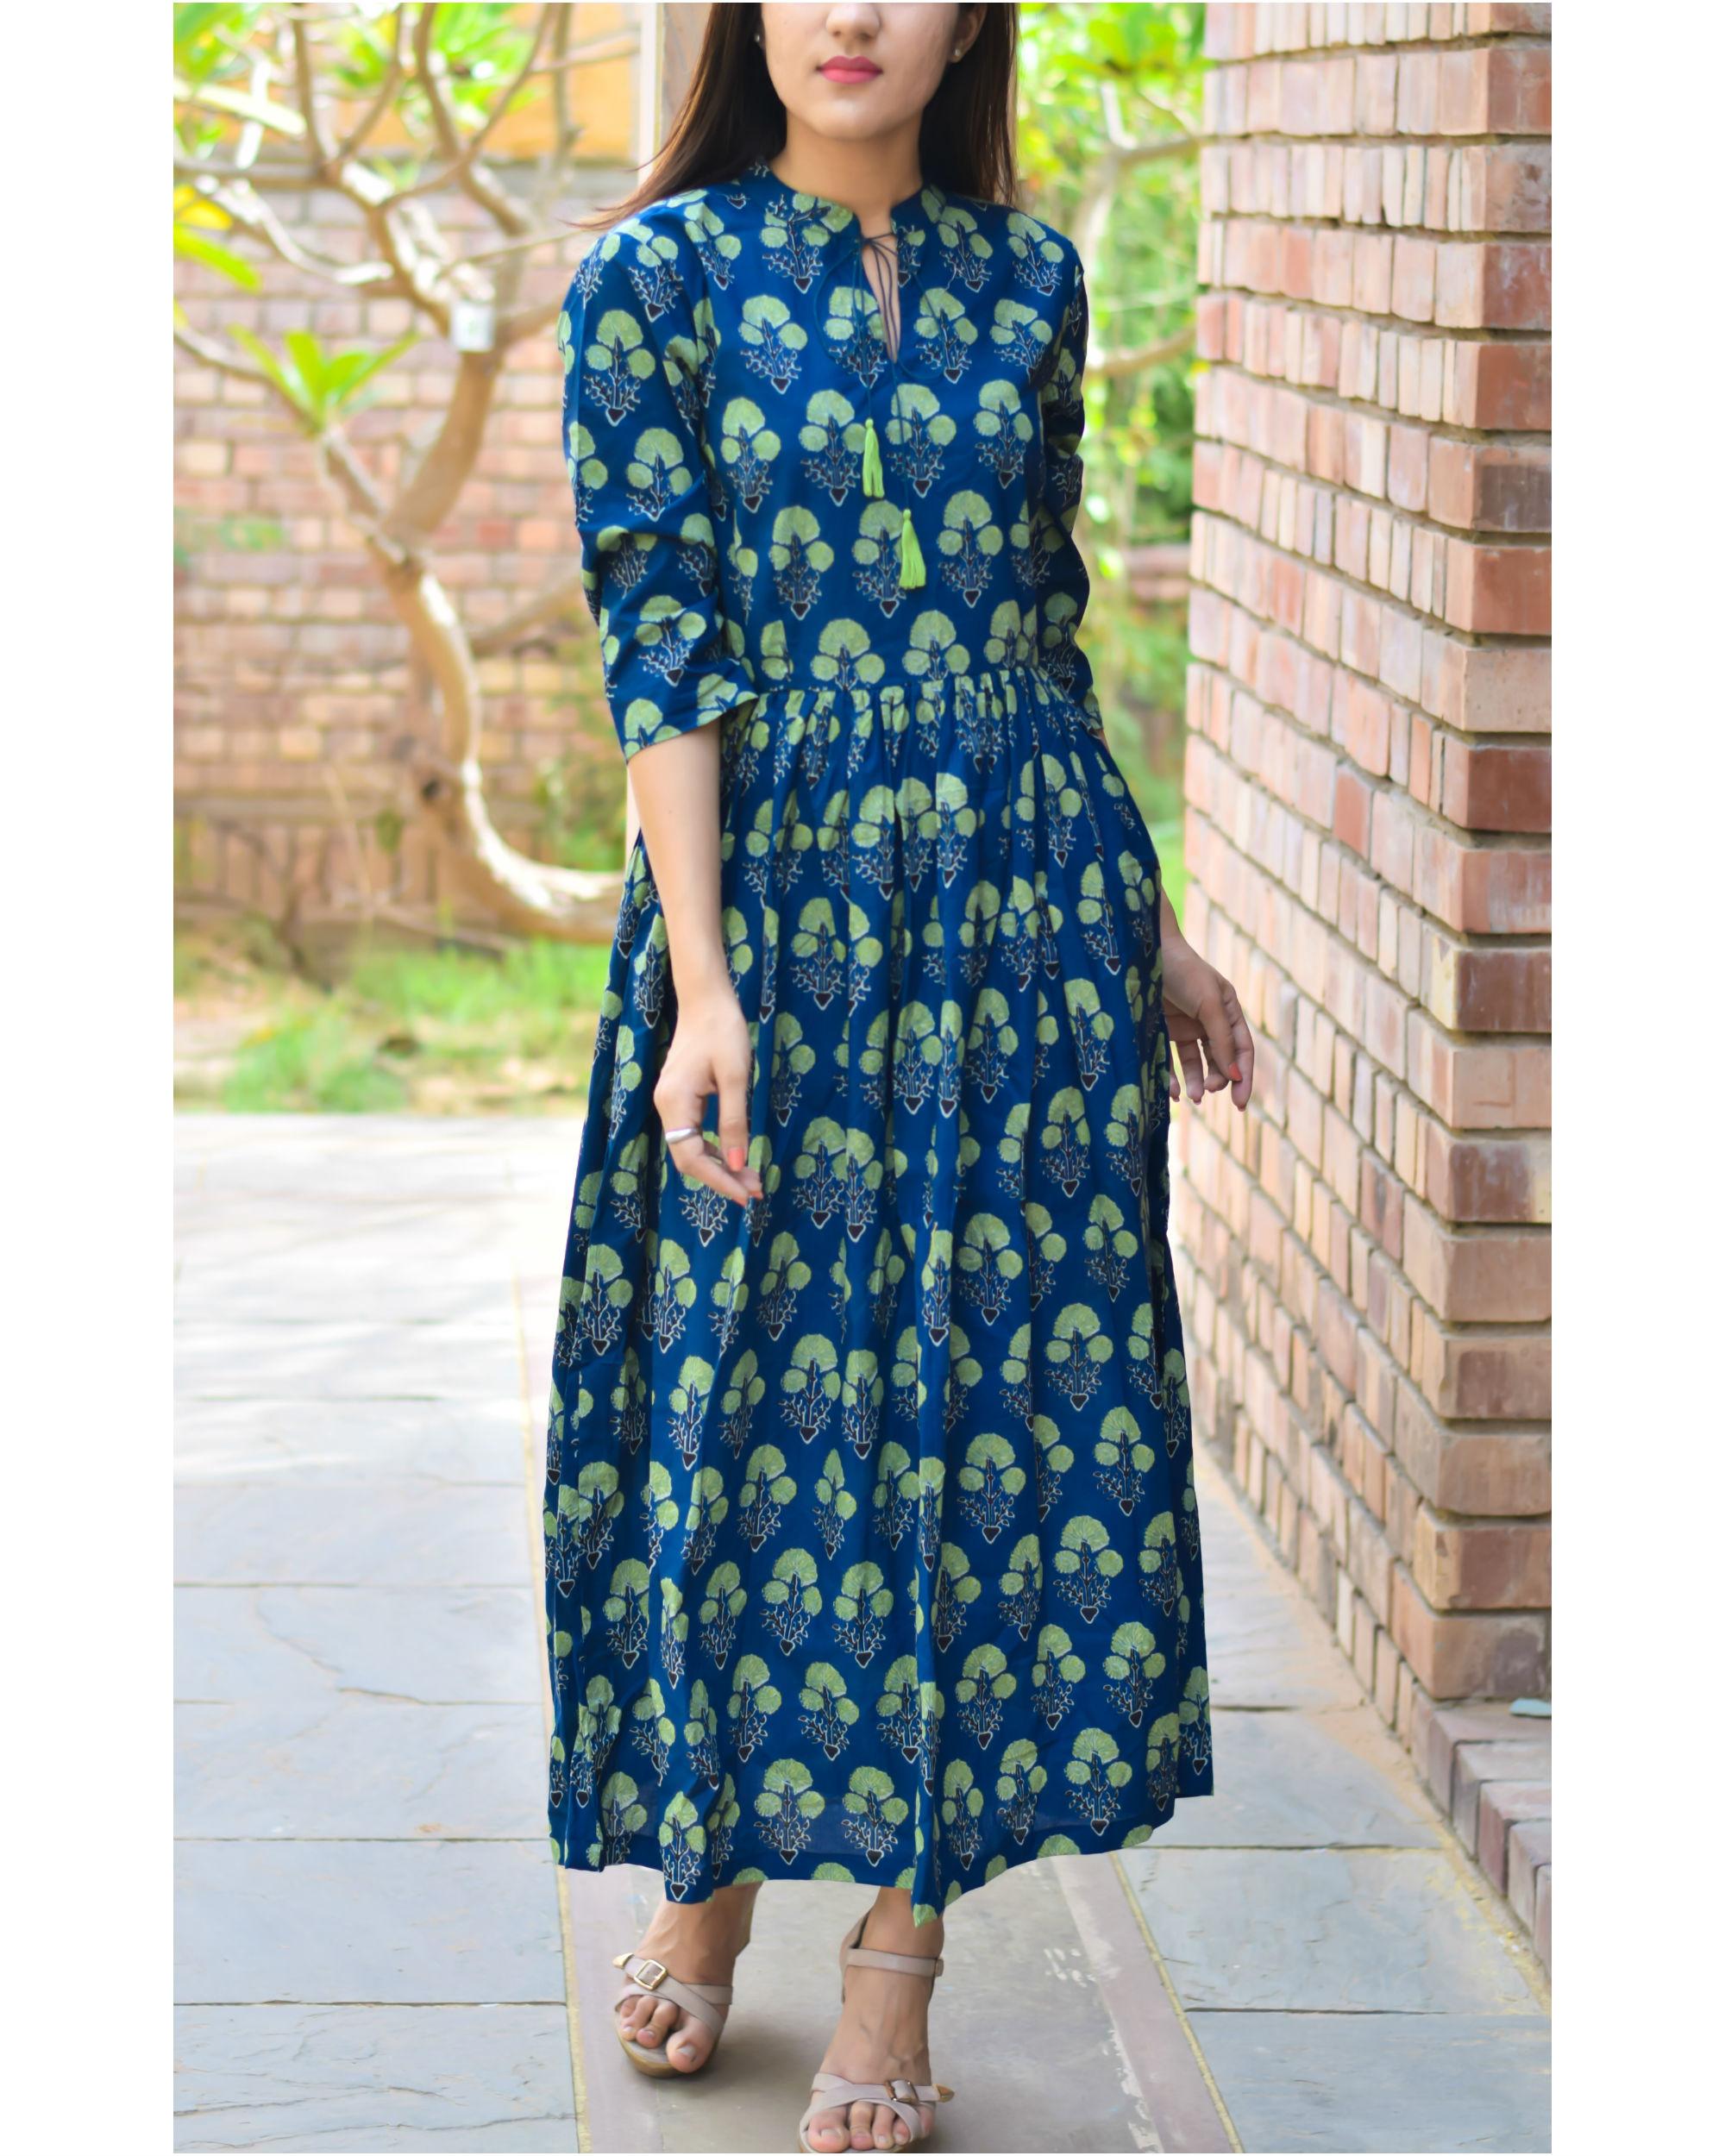 Blue and green tassel dress